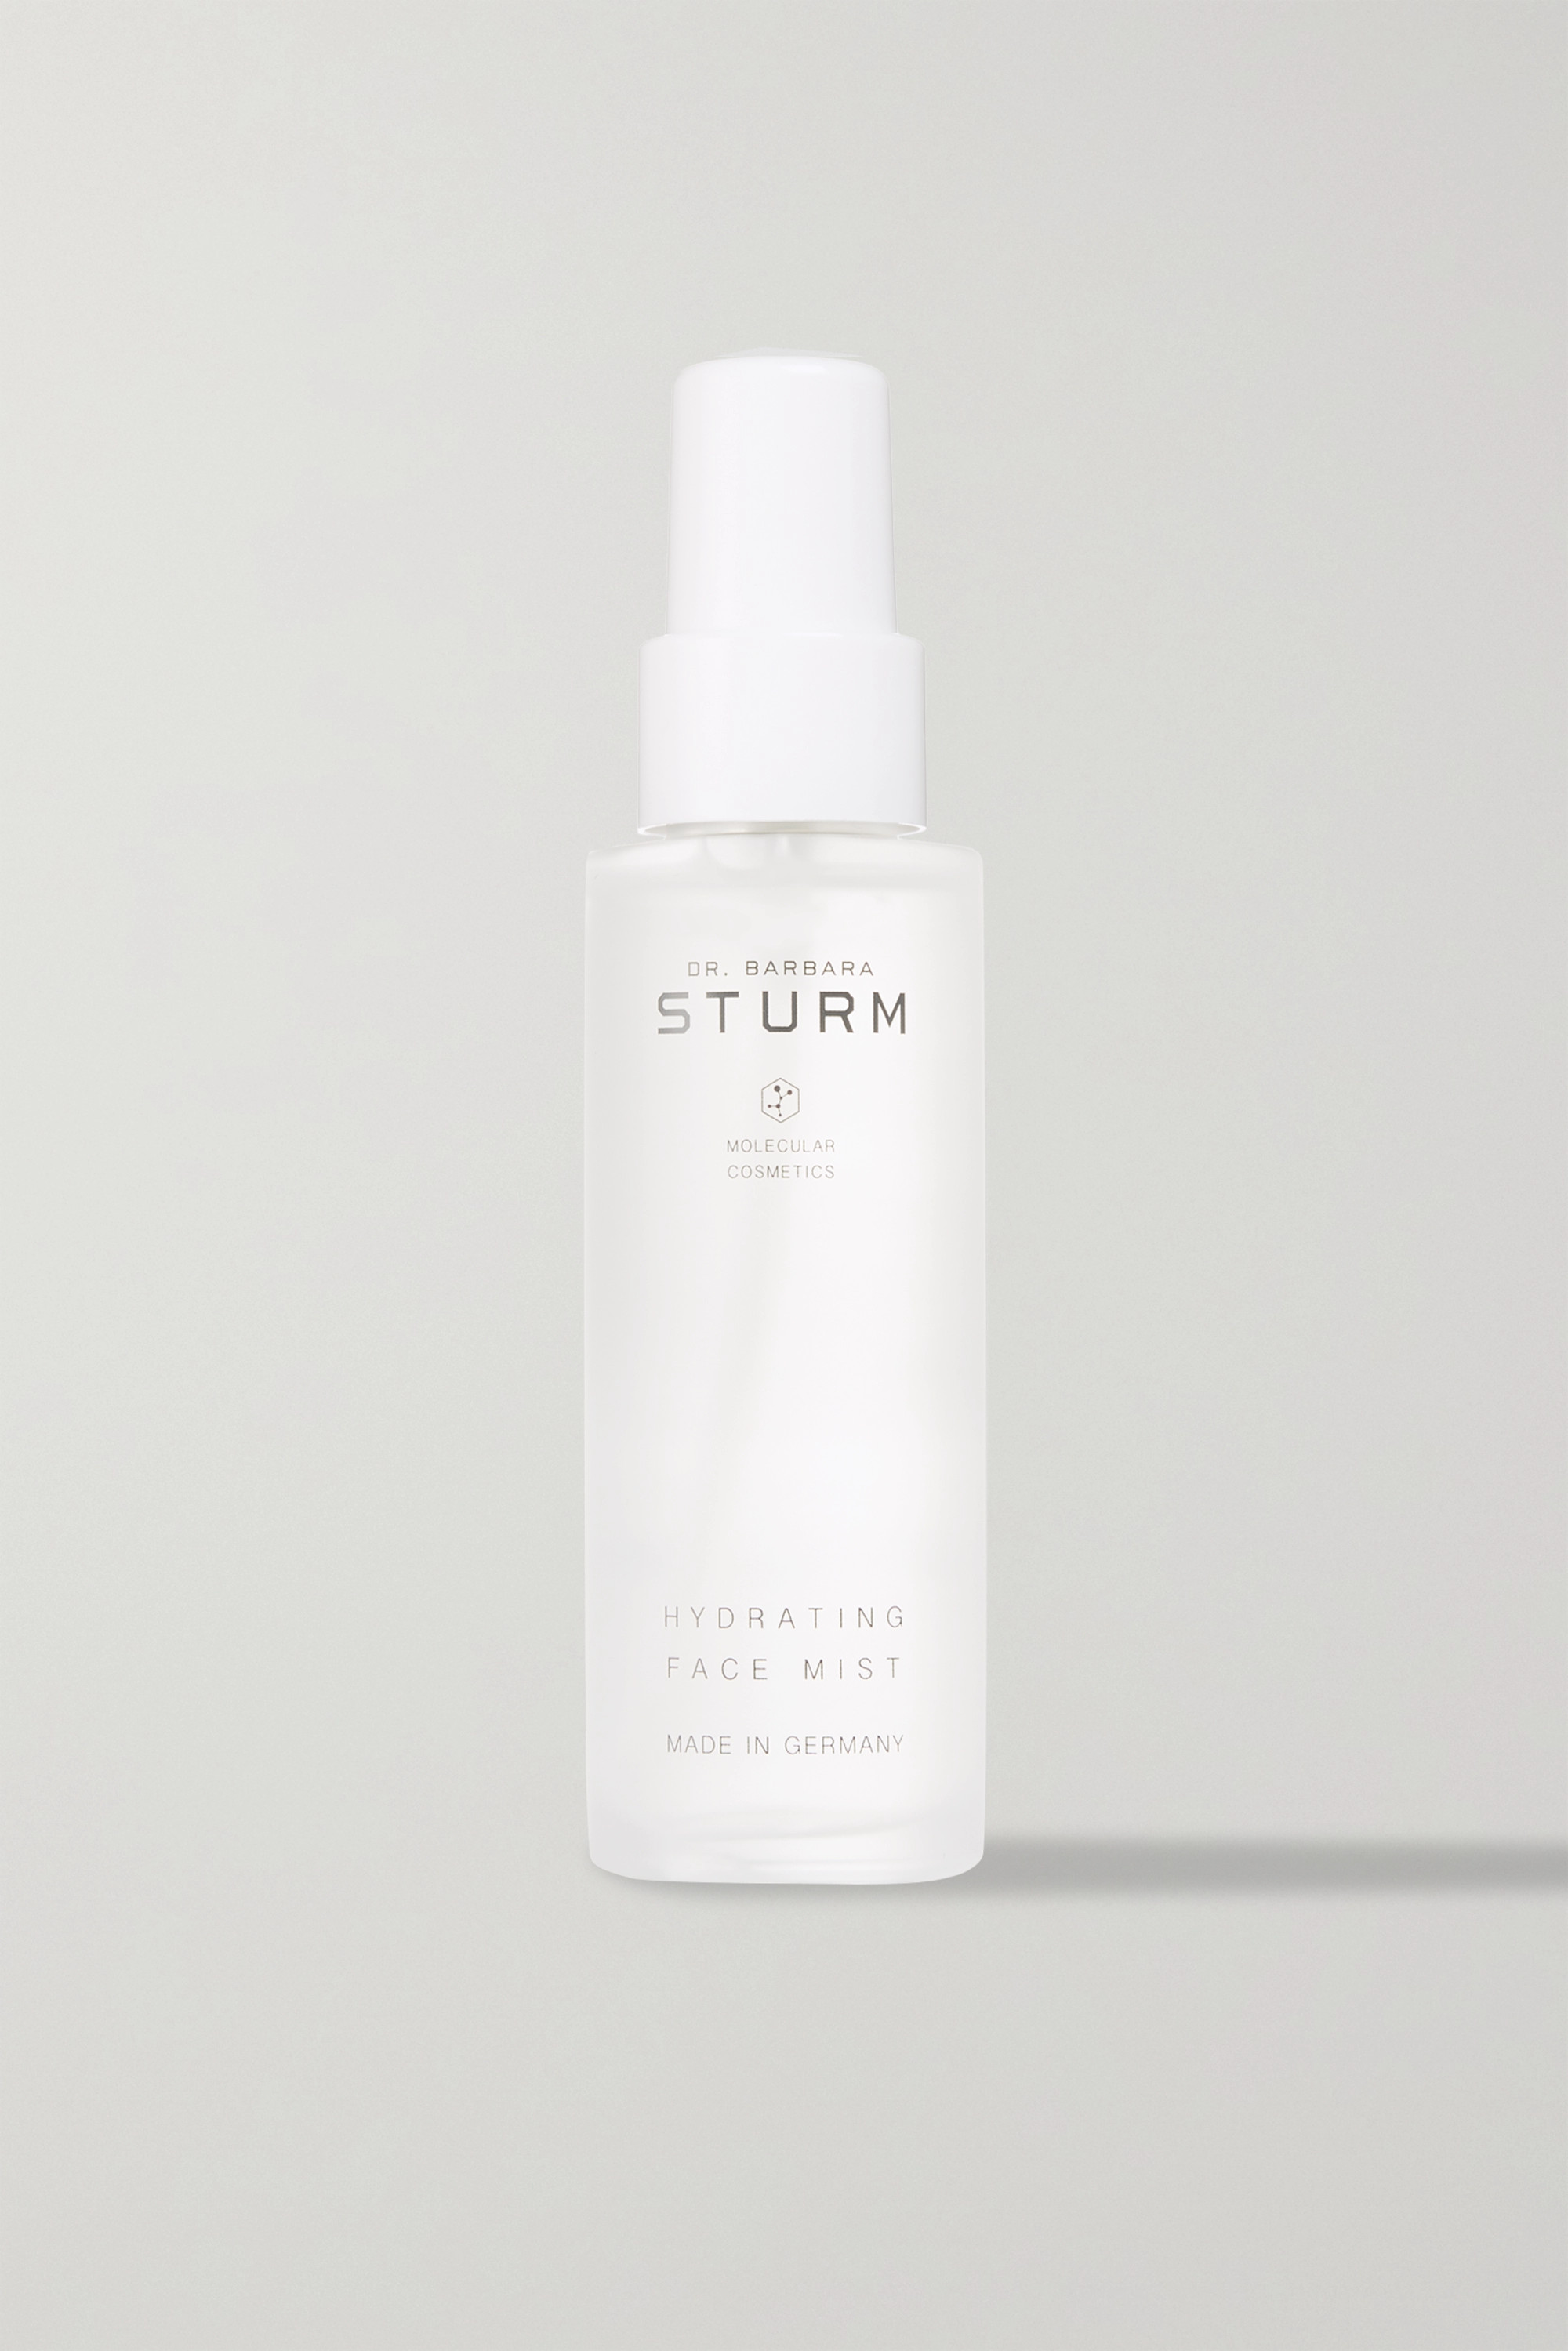 Dr. Barbara Sturm Hydrating Face Mist, 50ml